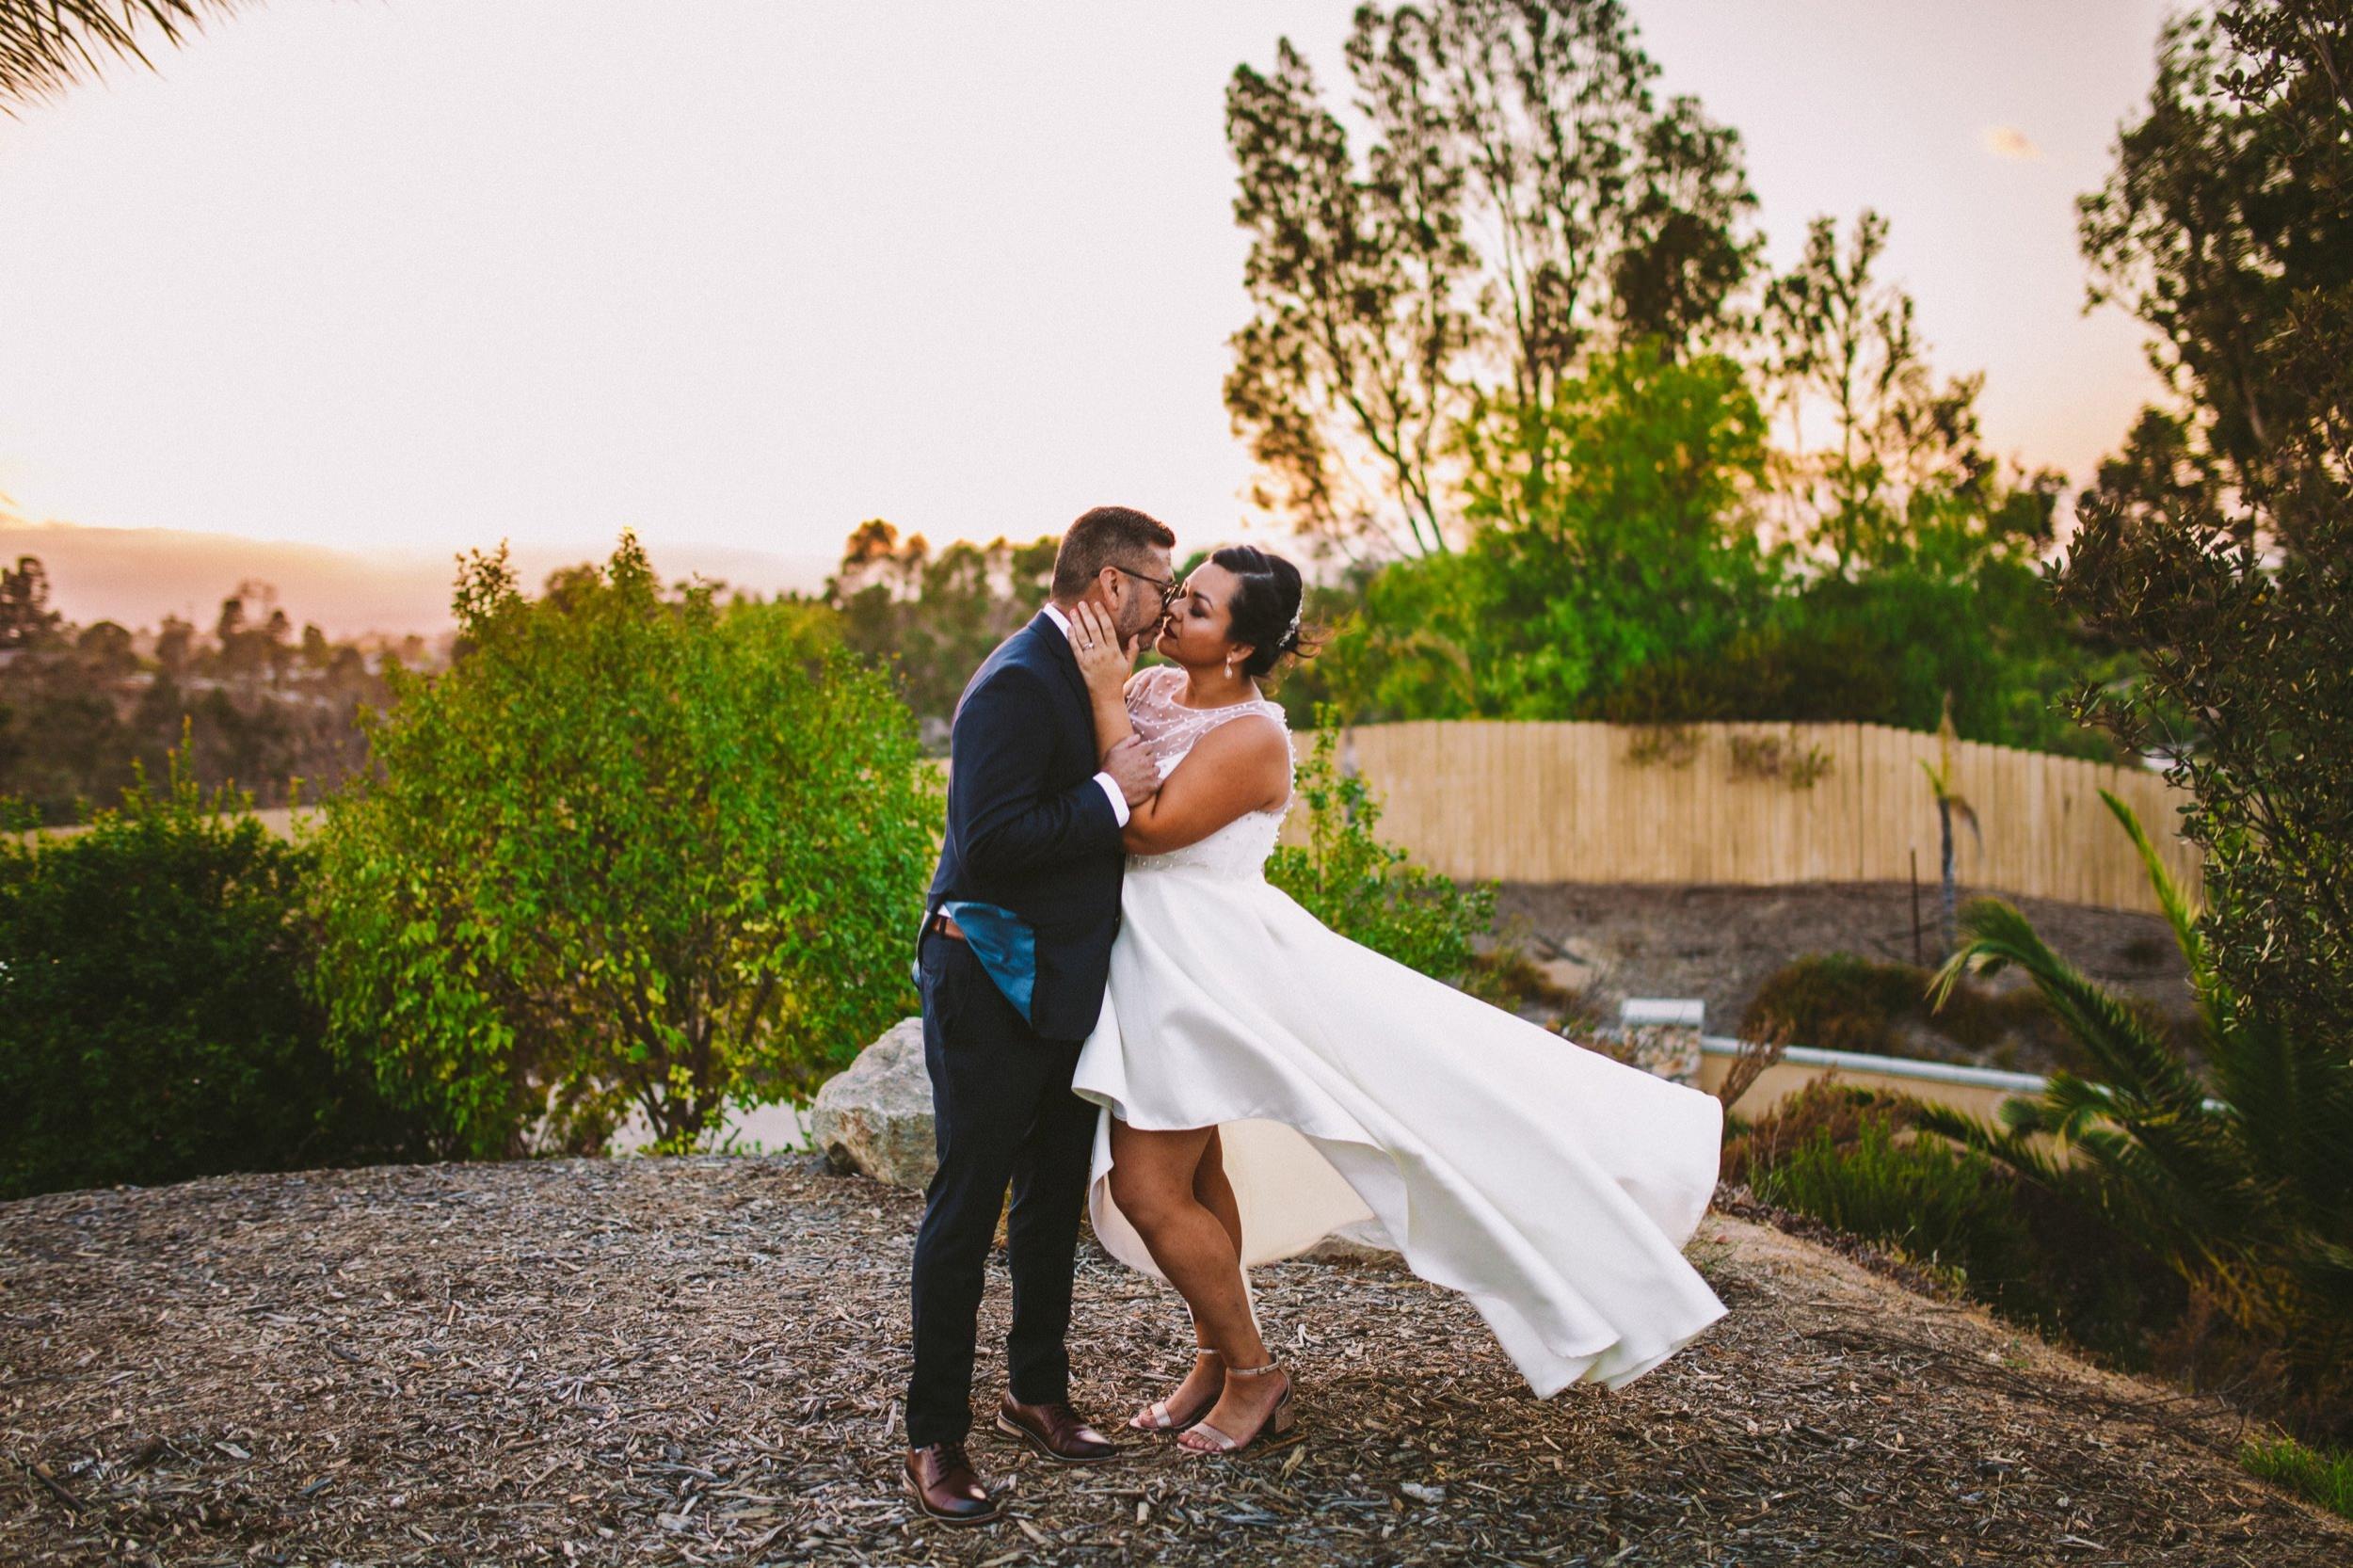 Intimate & colorful Temecula Documentary Wedding Photography-89.jpg